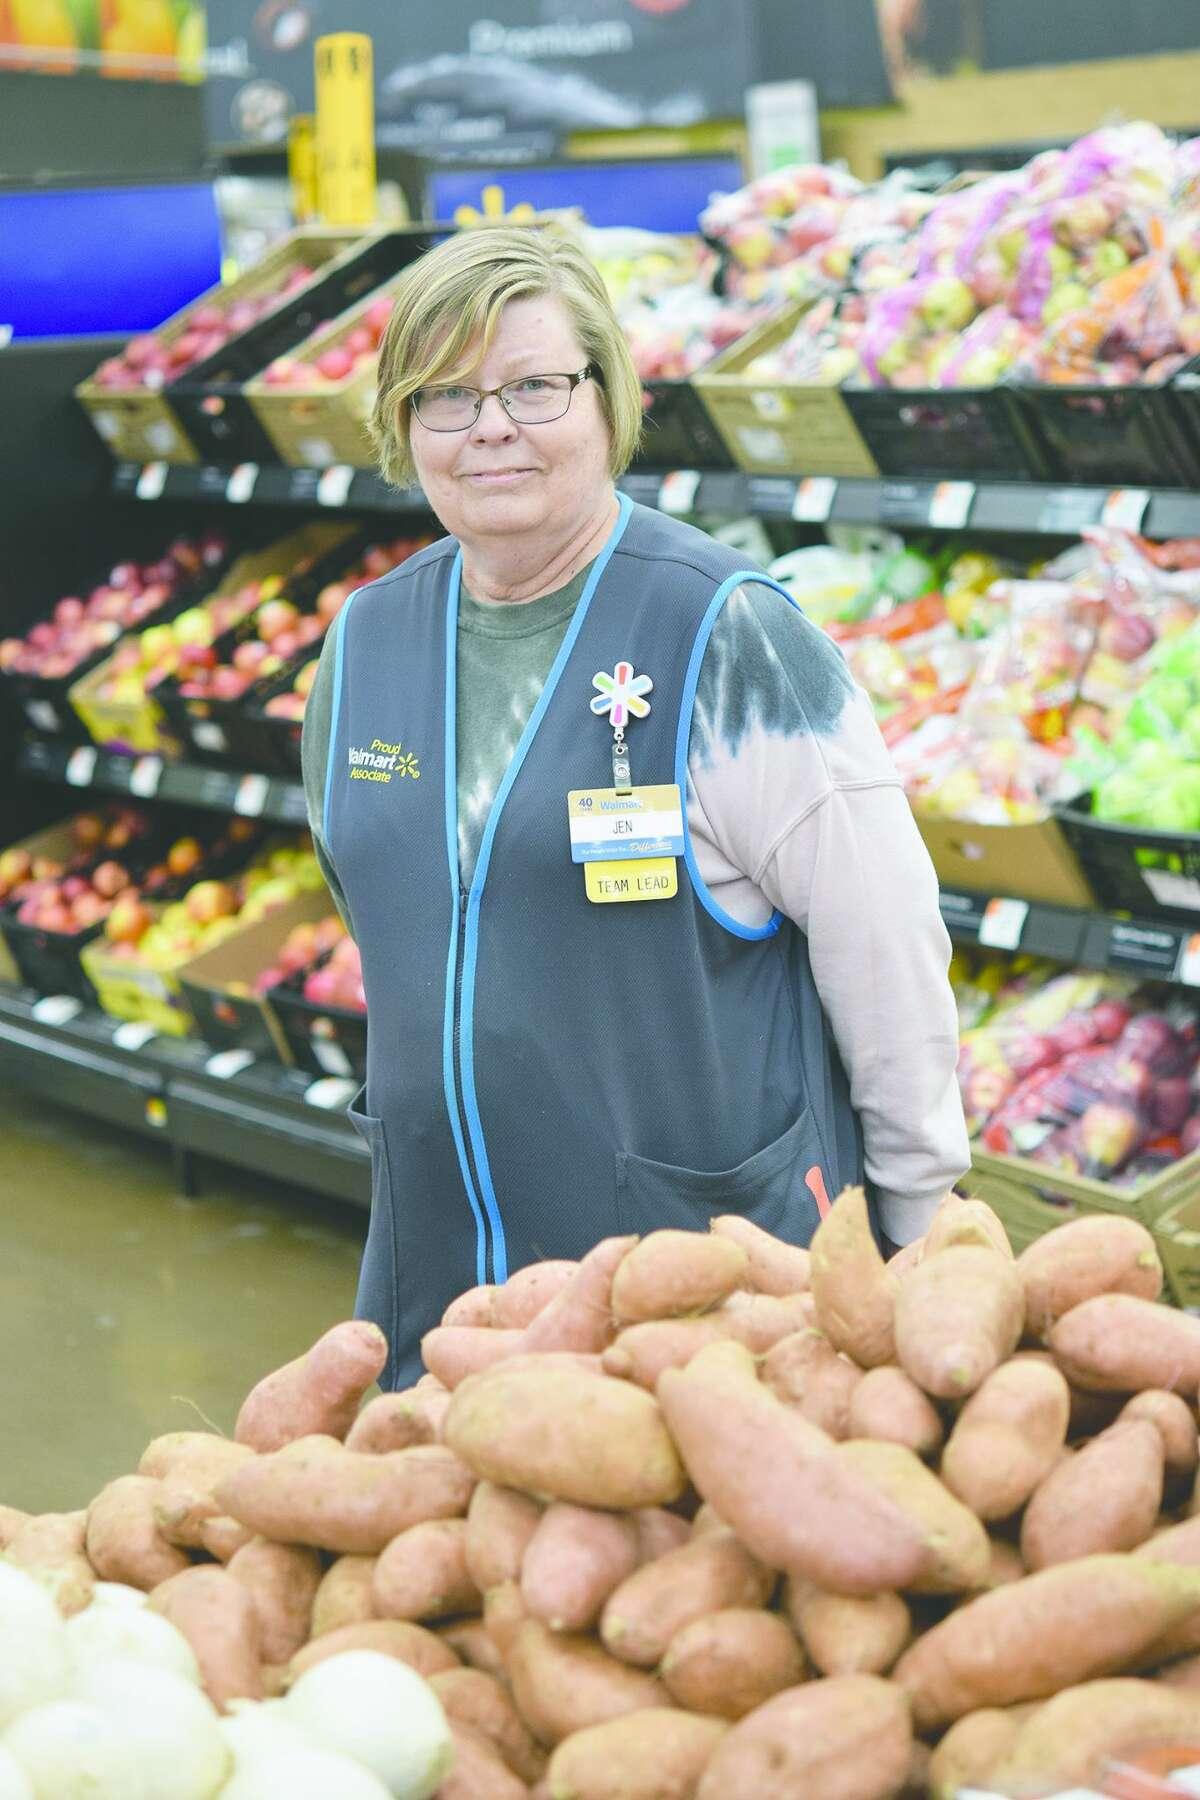 Jennifer Furlong at work at Walmart.